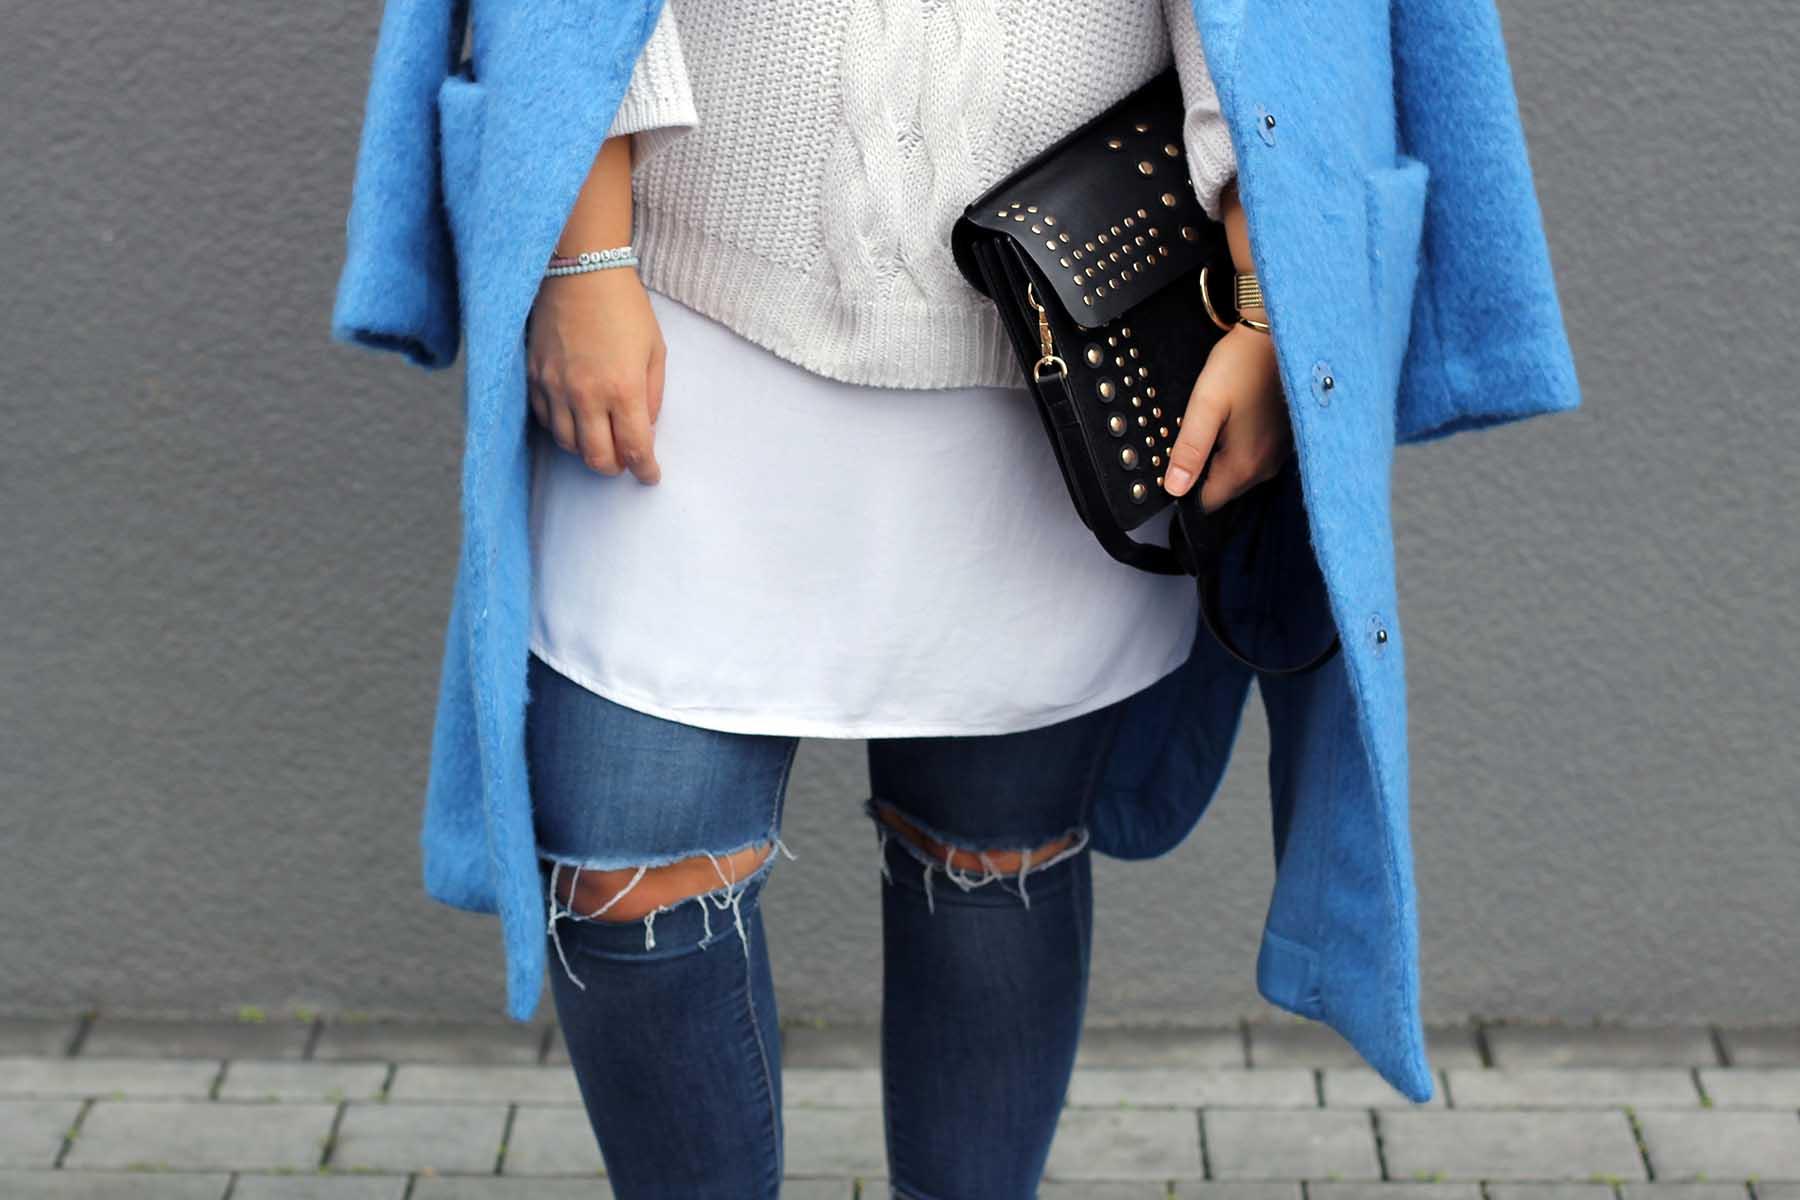 outfit-look-style-modeblog-fashionblog-blauer-mantel-jeans-balenciaga-lookalike-boots-chloe14